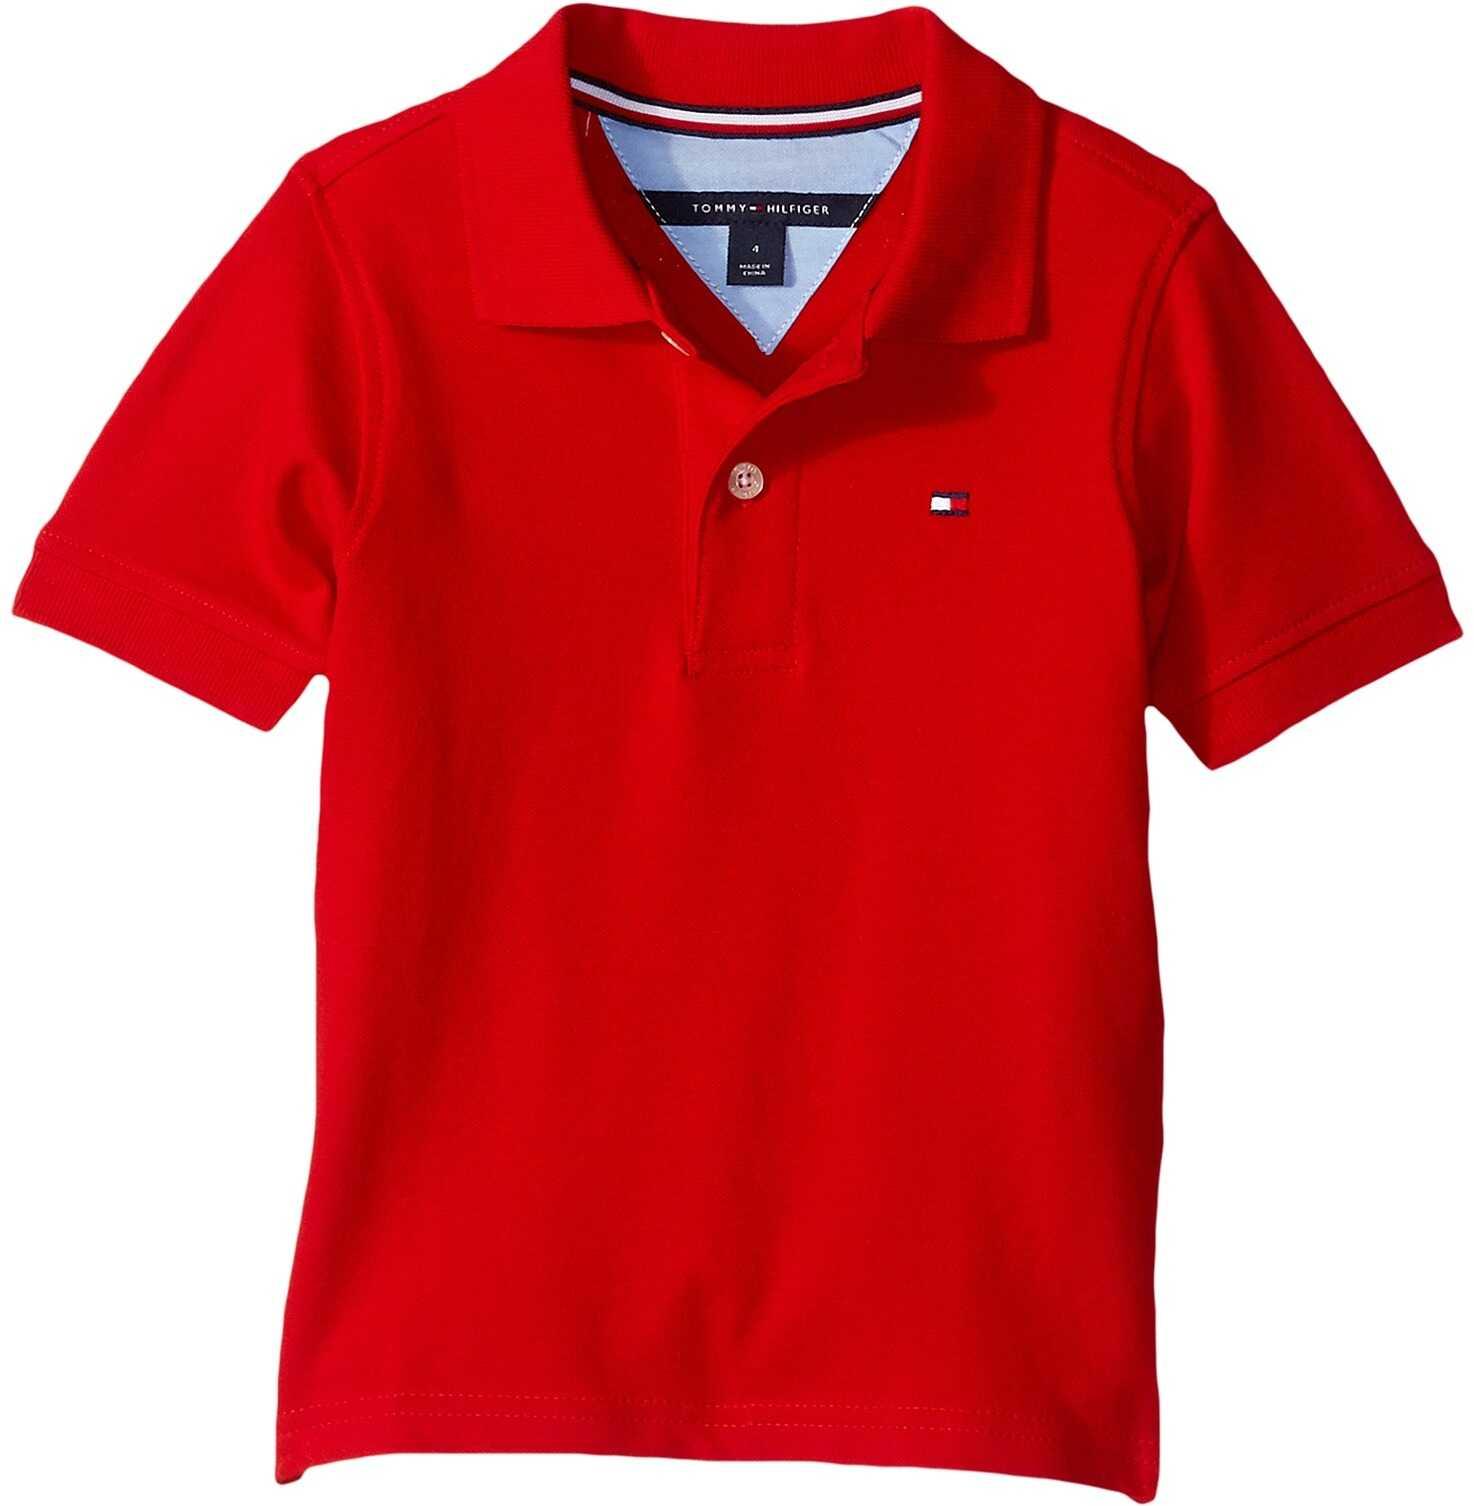 Tommy Hilfiger Kids Stretch Ivy Polo (Big Kids) Regal Red